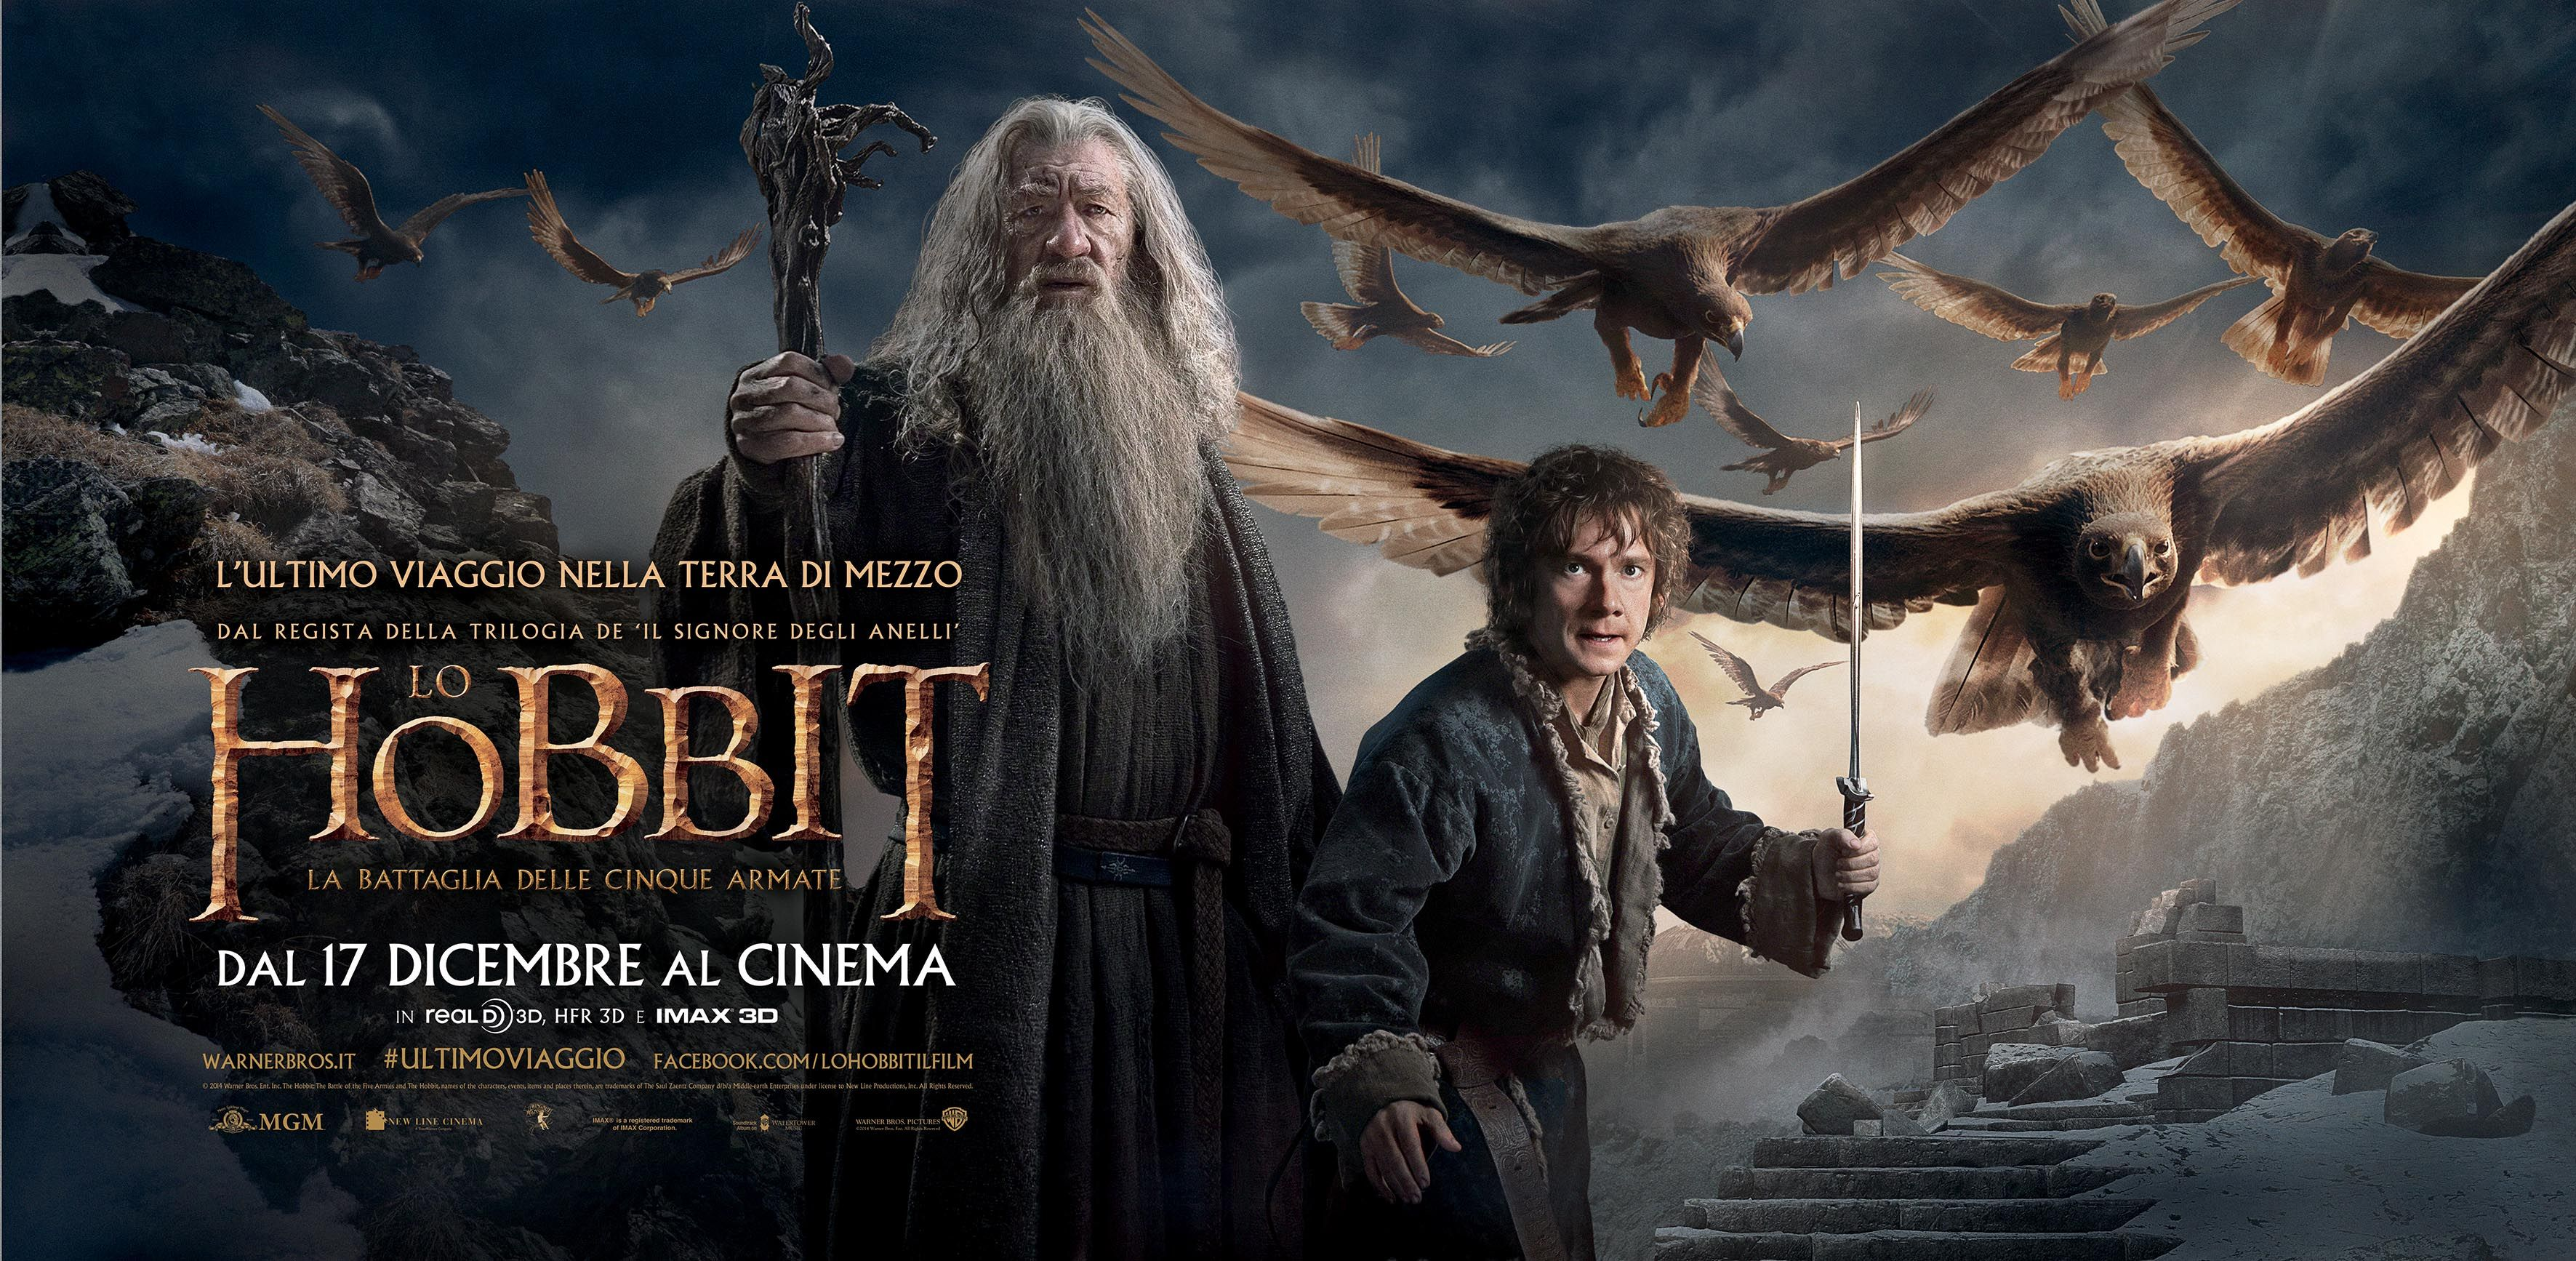 TheHobbit #Hobbit #HobbitPremiere #UltimoViaggio #TerreDiMezzo ...